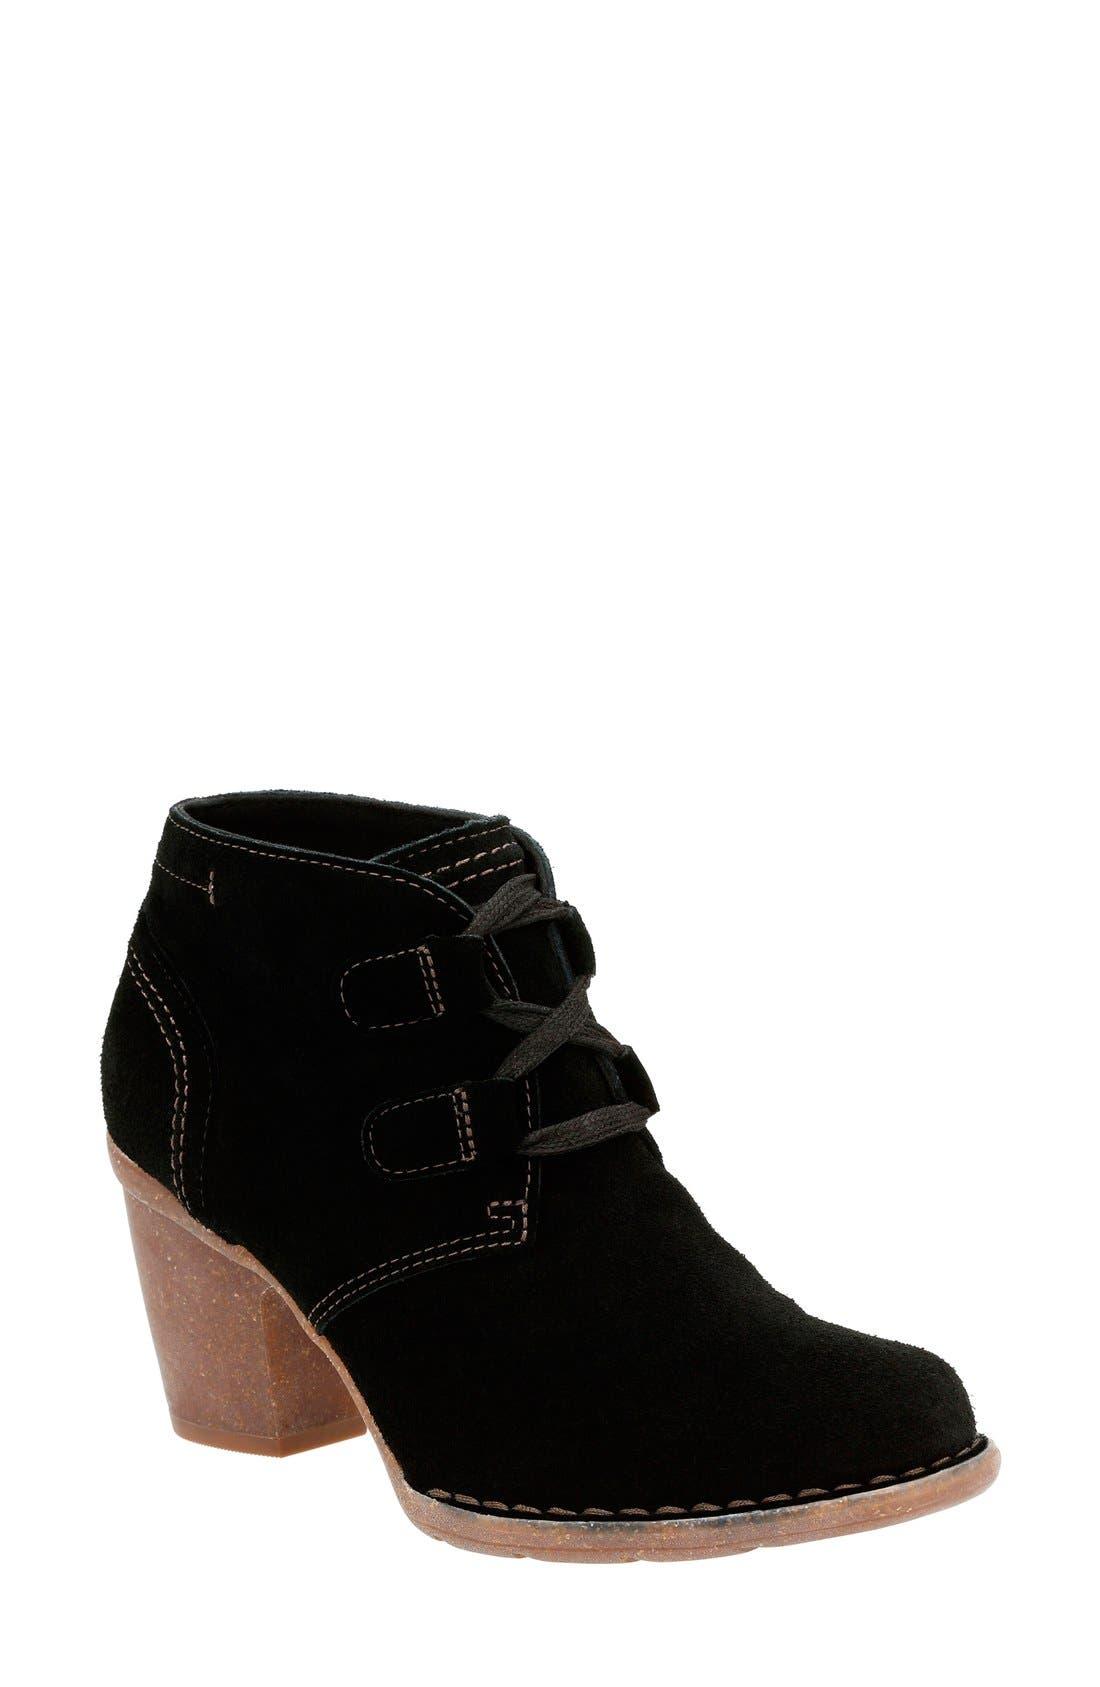 'Carleta Lyon' Ankle Boot,                         Main,                         color, BLACK SUEDE